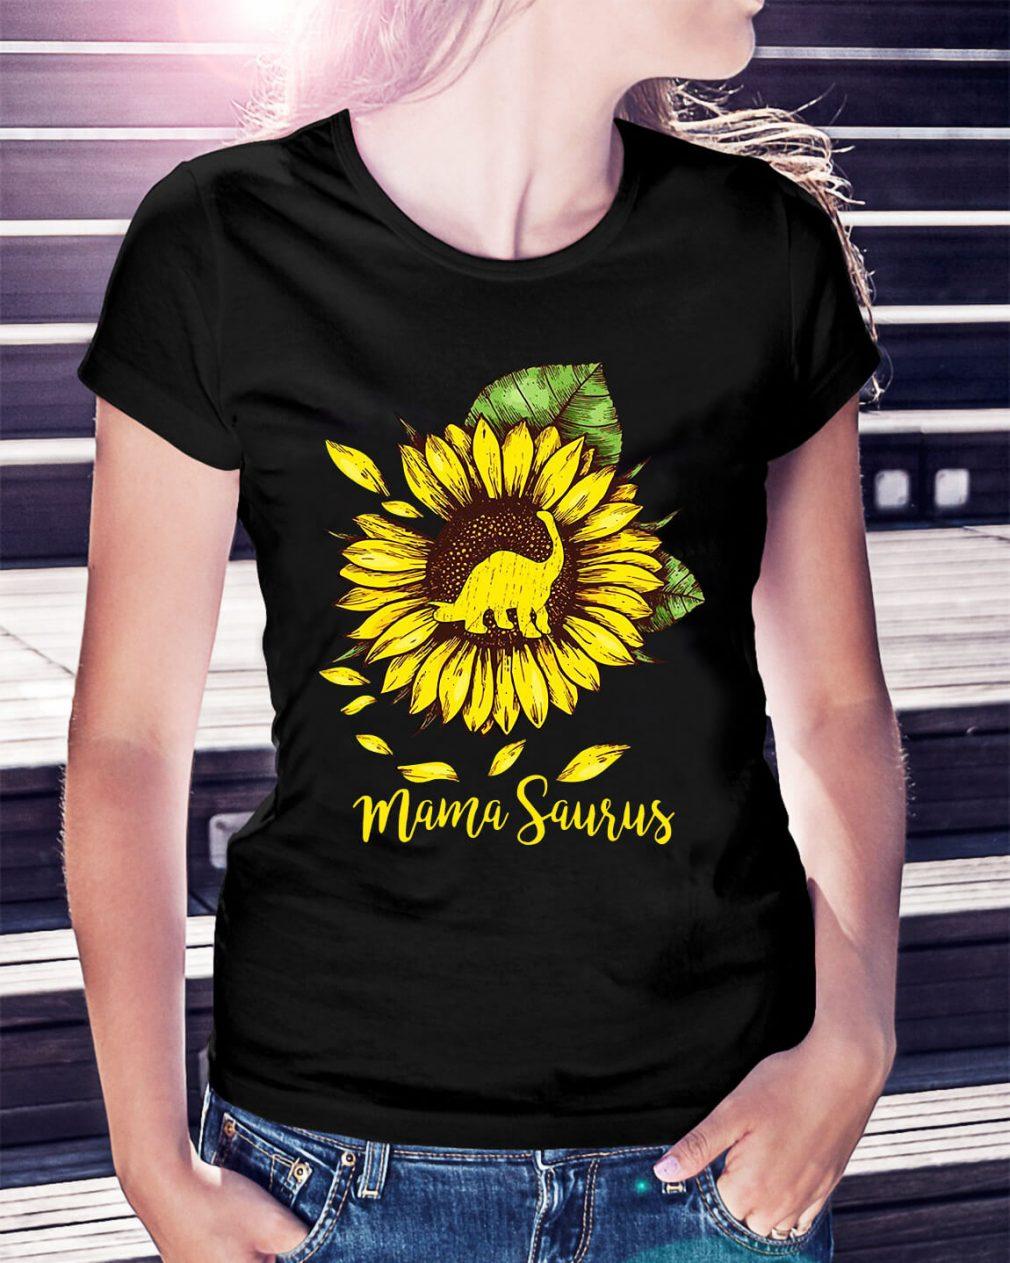 Sunflower Mama saurus shirt